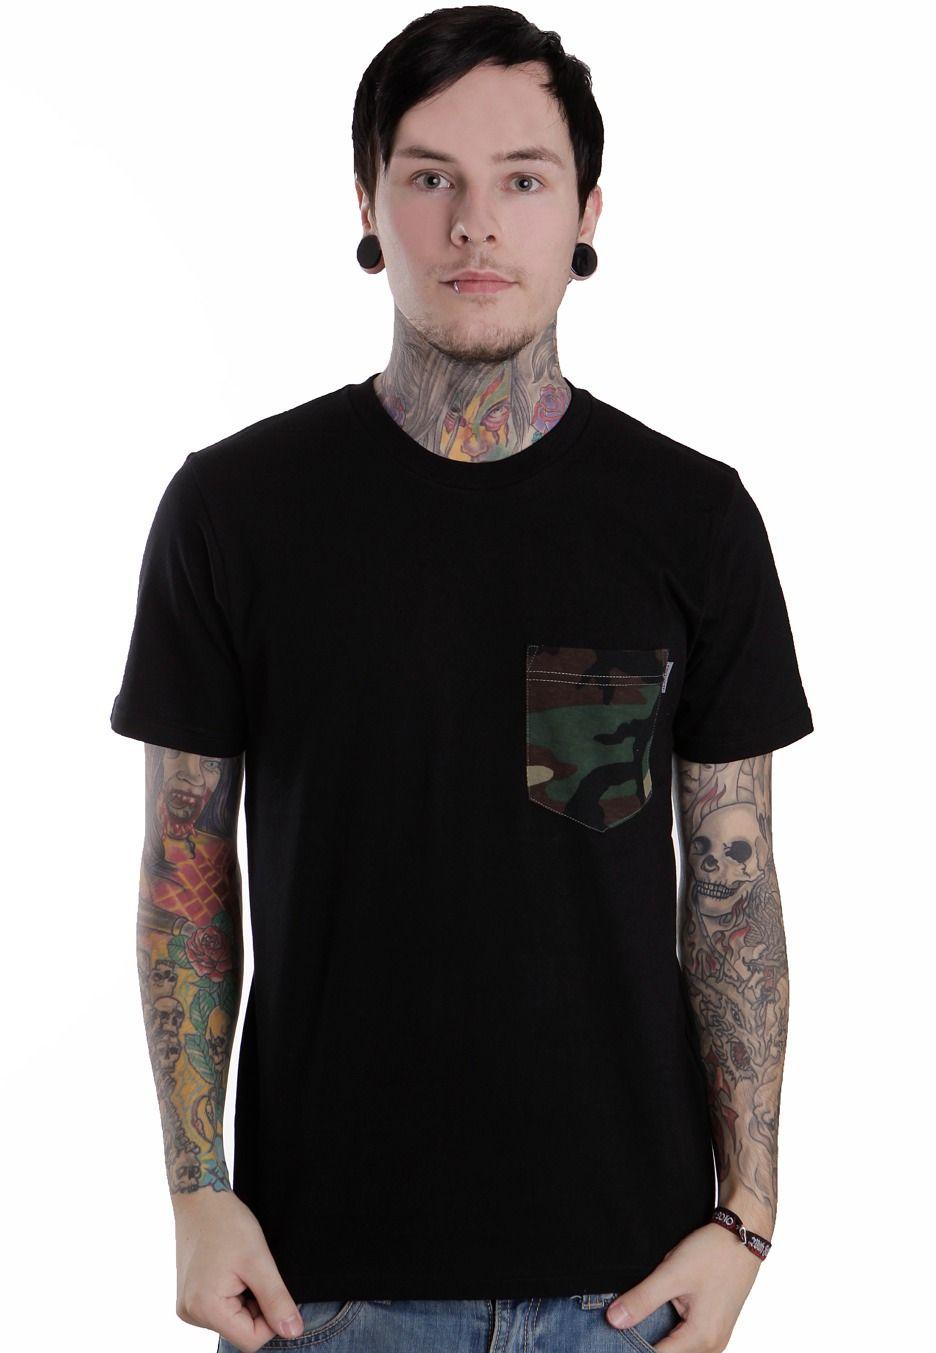 Carhartt-pocket-camo-black-camo-green-t-shirt